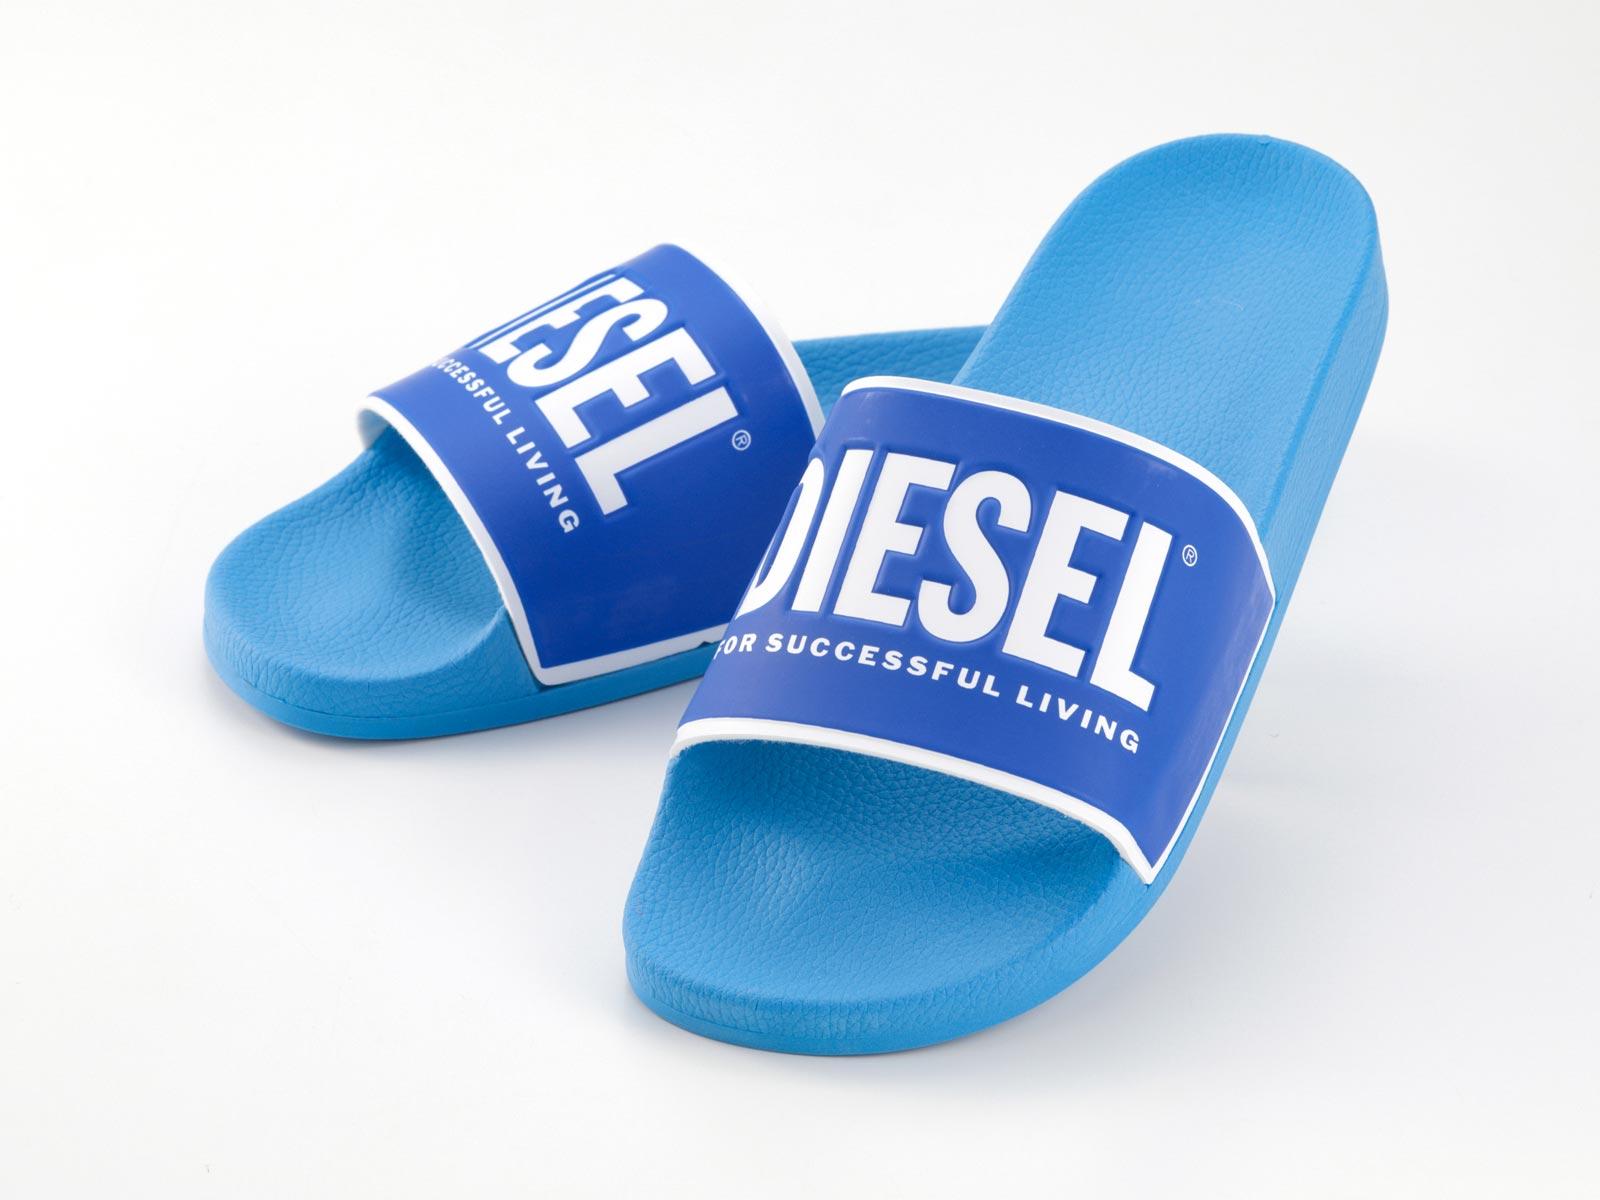 Bauer Flip Flop Hockey Sandals Blue Adult Sandal EVA Sole Shower Beach 1047200